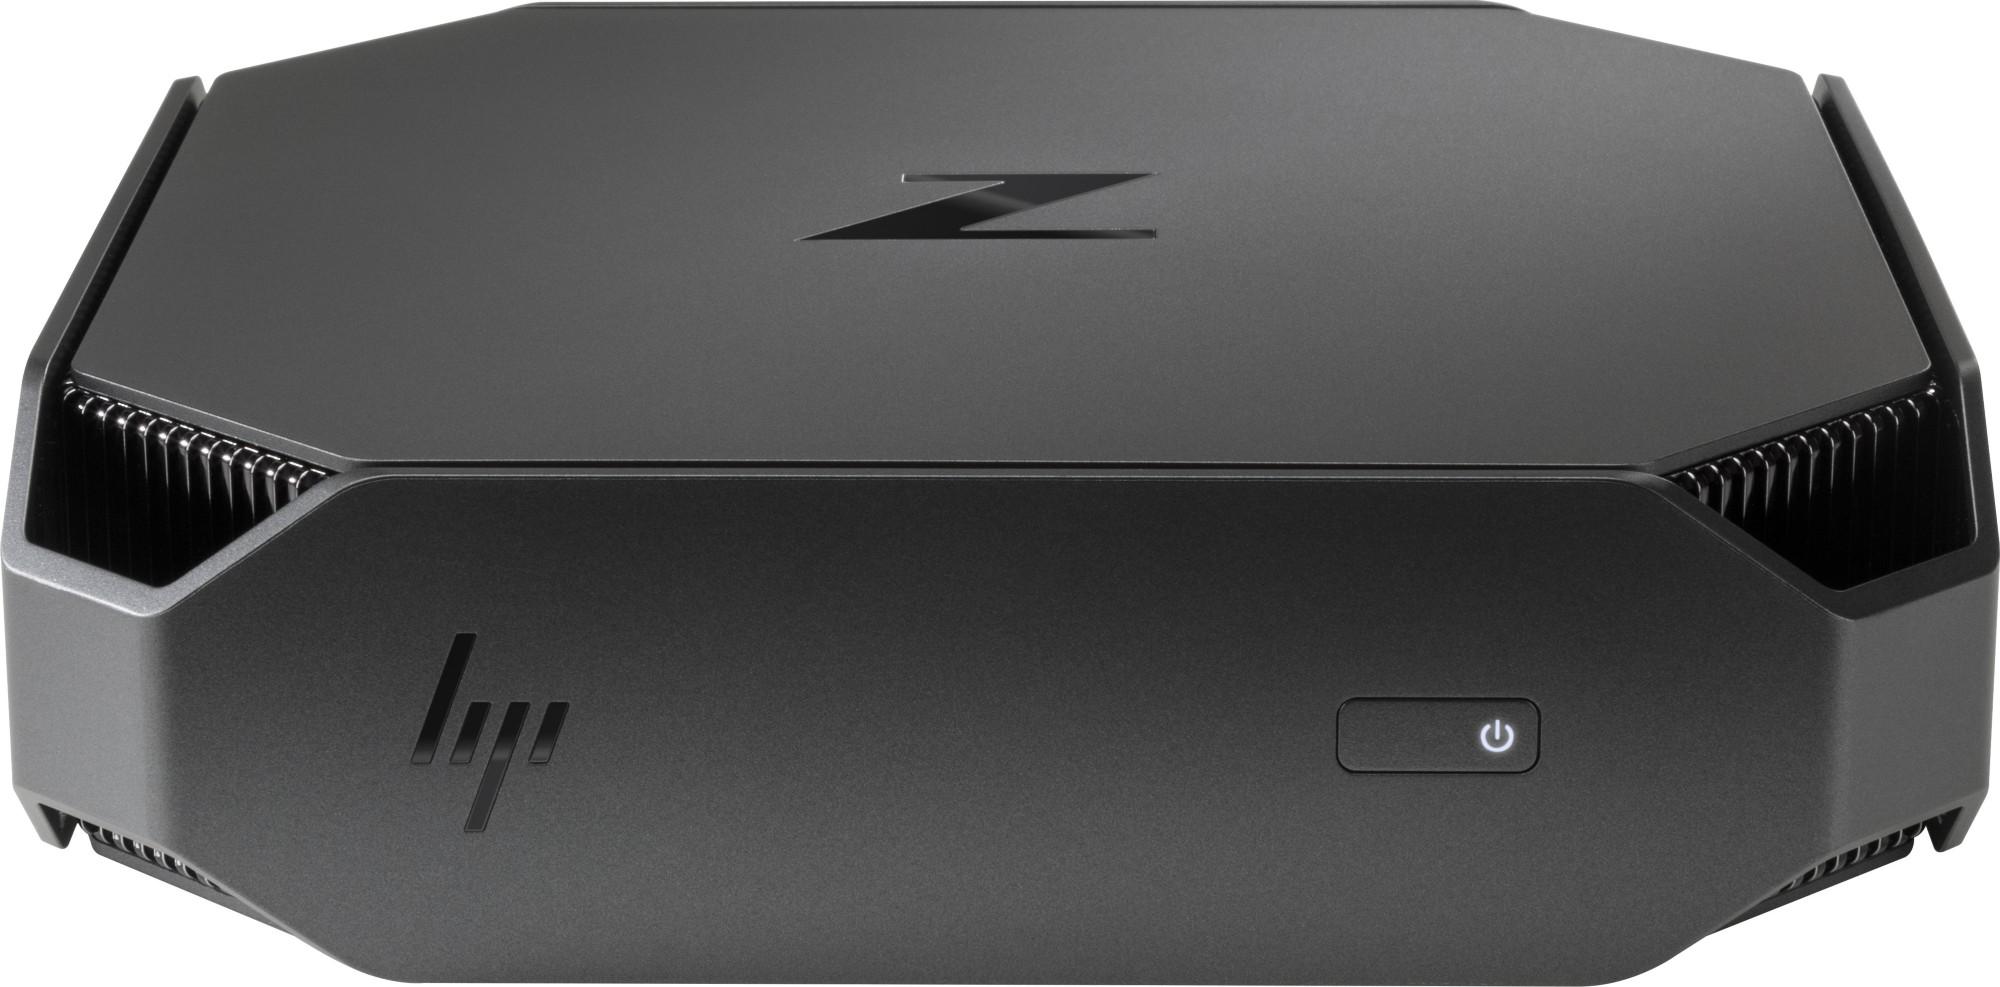 HP Z2 Mini G3 Workstation (ENERGY STAR)